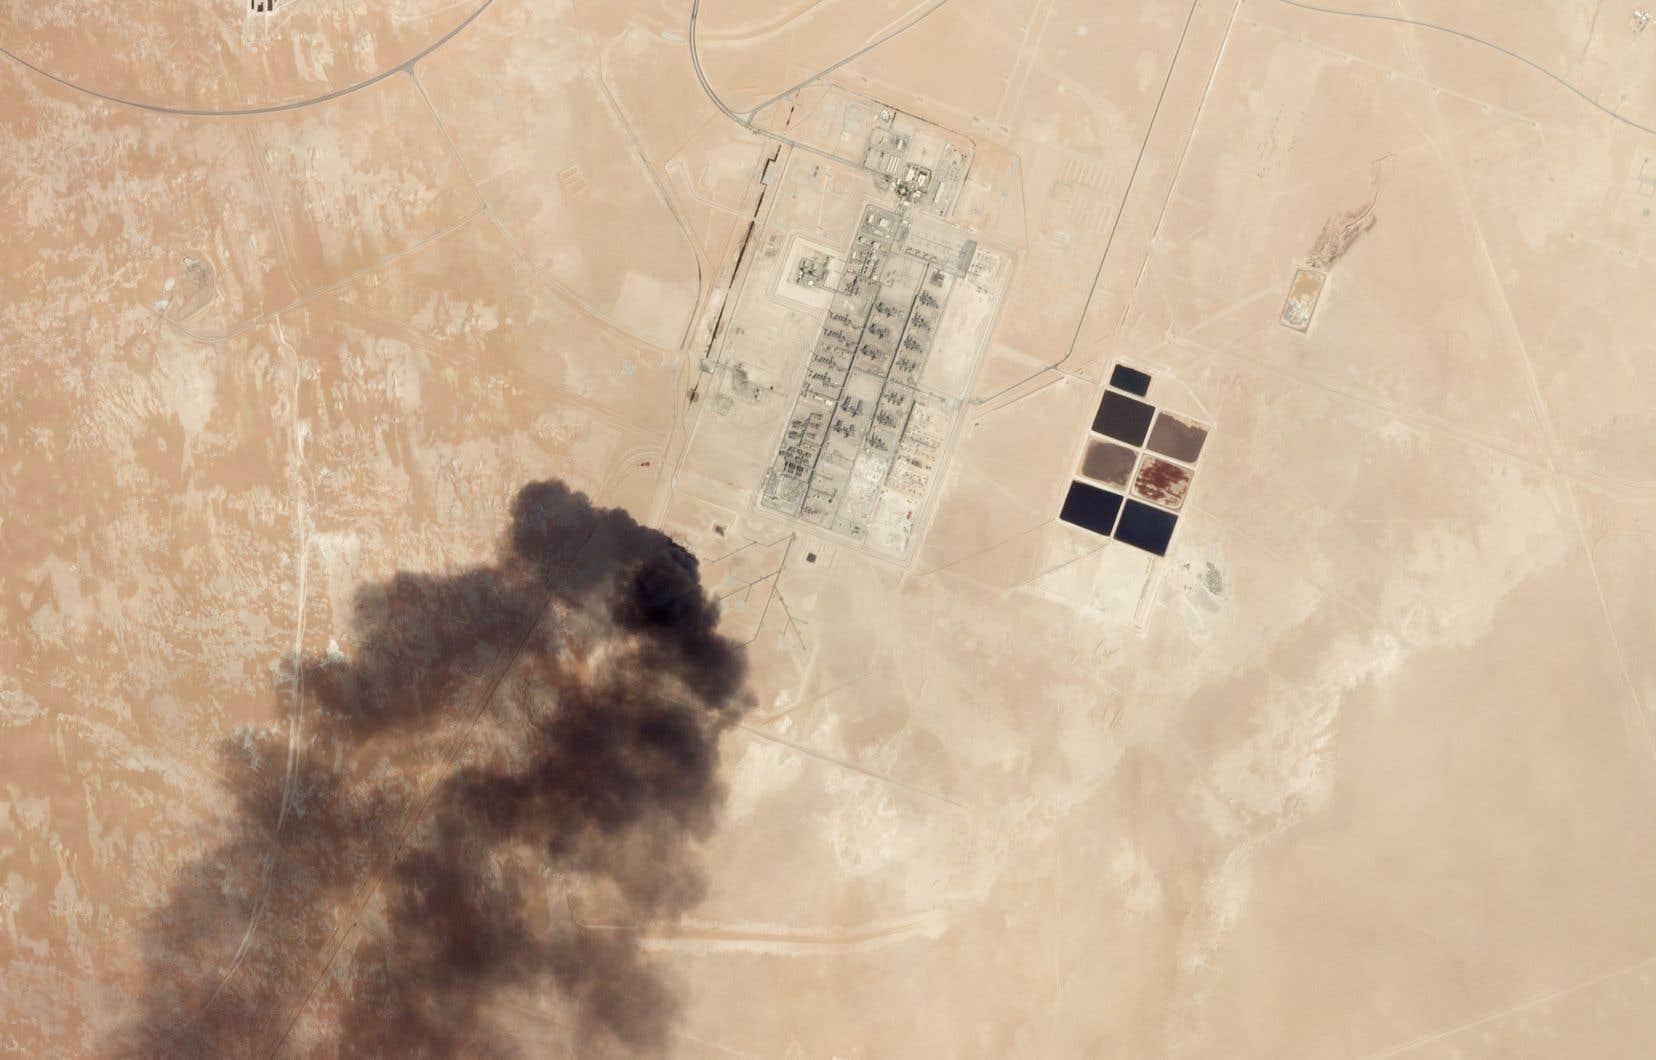 L'Arabie saoudite a accusé mercredi l'Iran d'avoir «parrainé» les attaques de samedi contre des installations pétrolières.